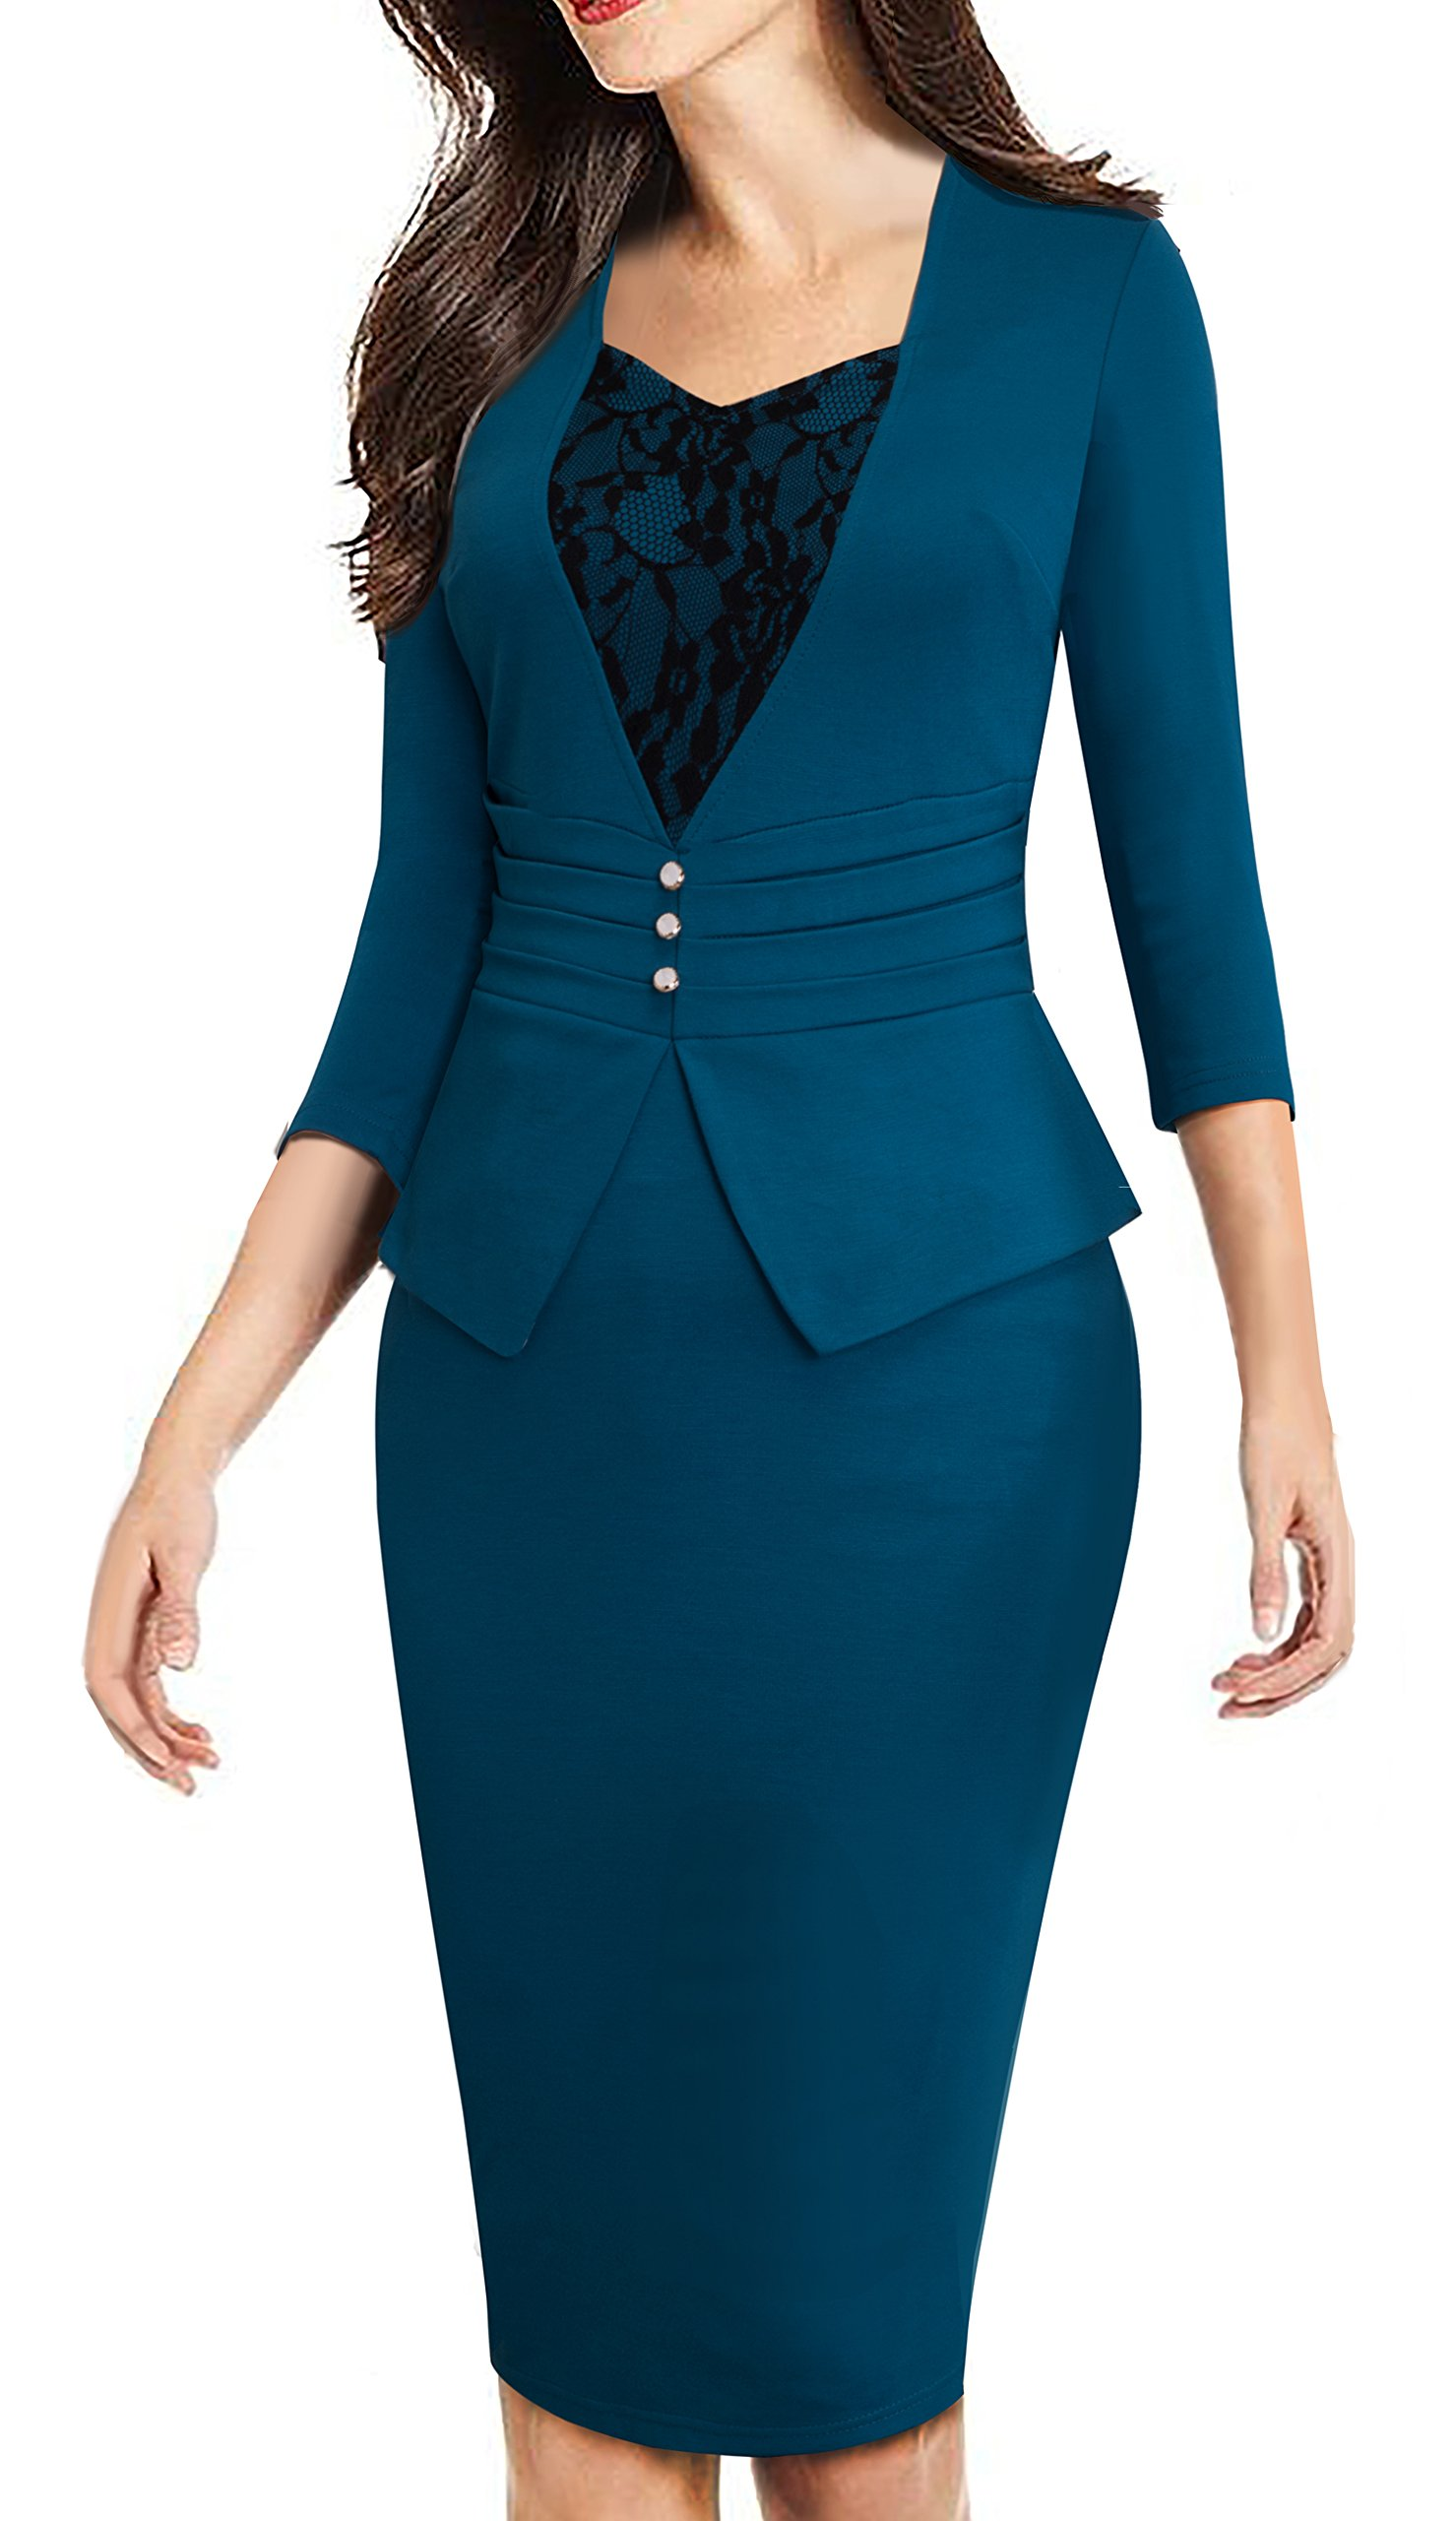 HOMEYEE Women's Elegant Business 3/4 Sleeve Lace Retro Pencil Sheath Dress B361 (10, Teal)